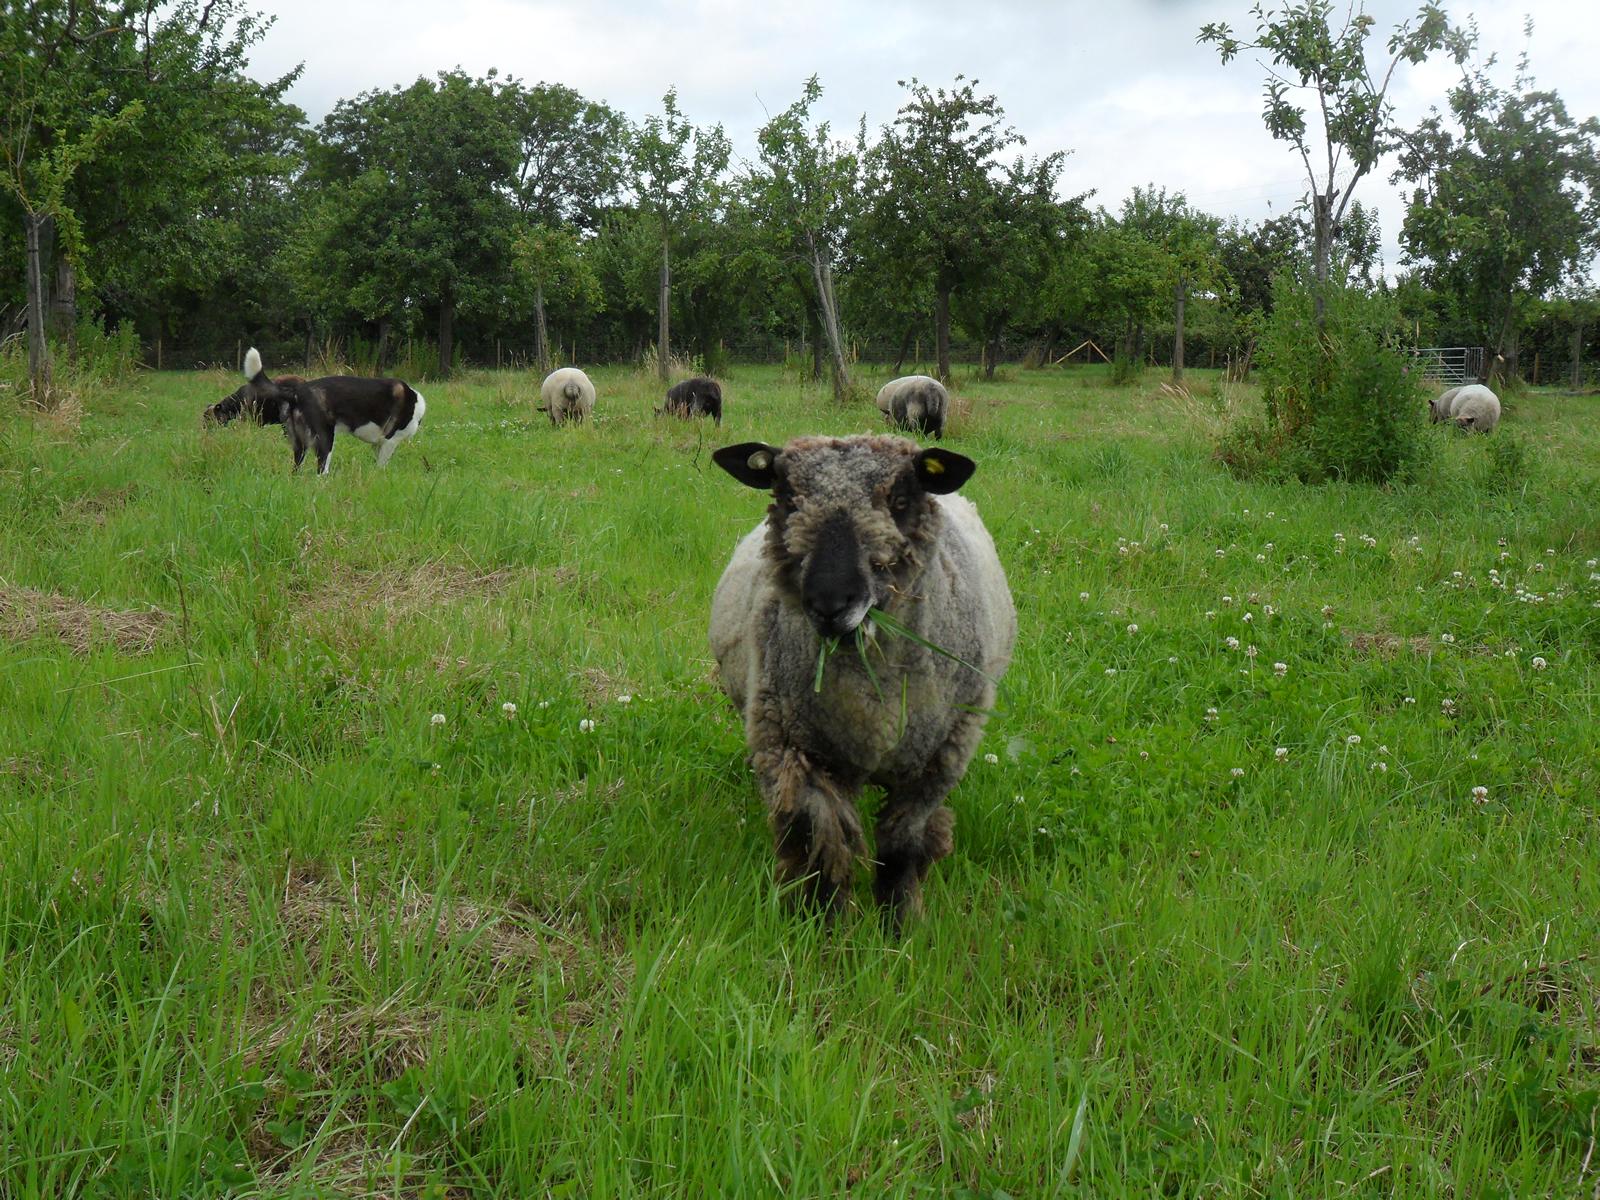 bluemli coloured ryeland sheep in new field